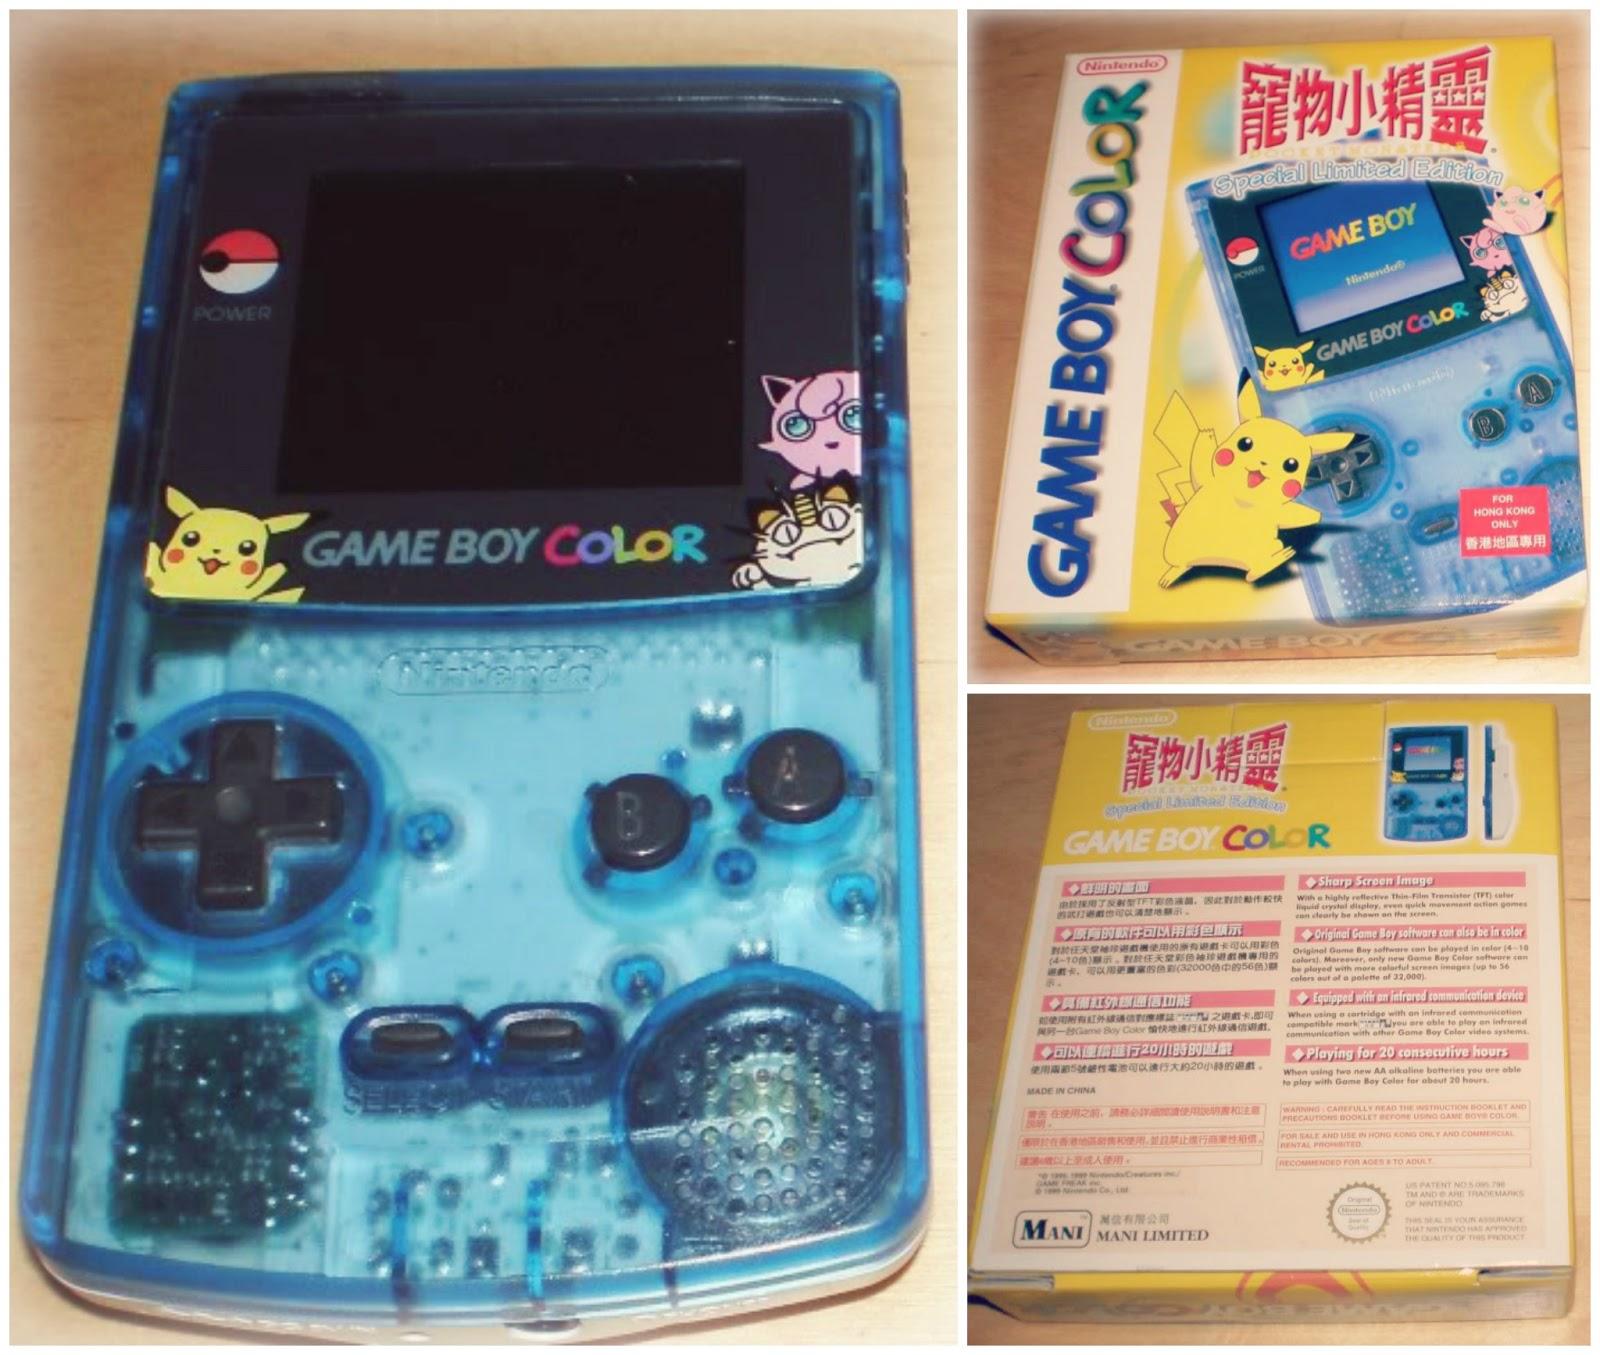 Territorio Pokémon: Game Boy Color: Special Limited Edition (Hong Kong)